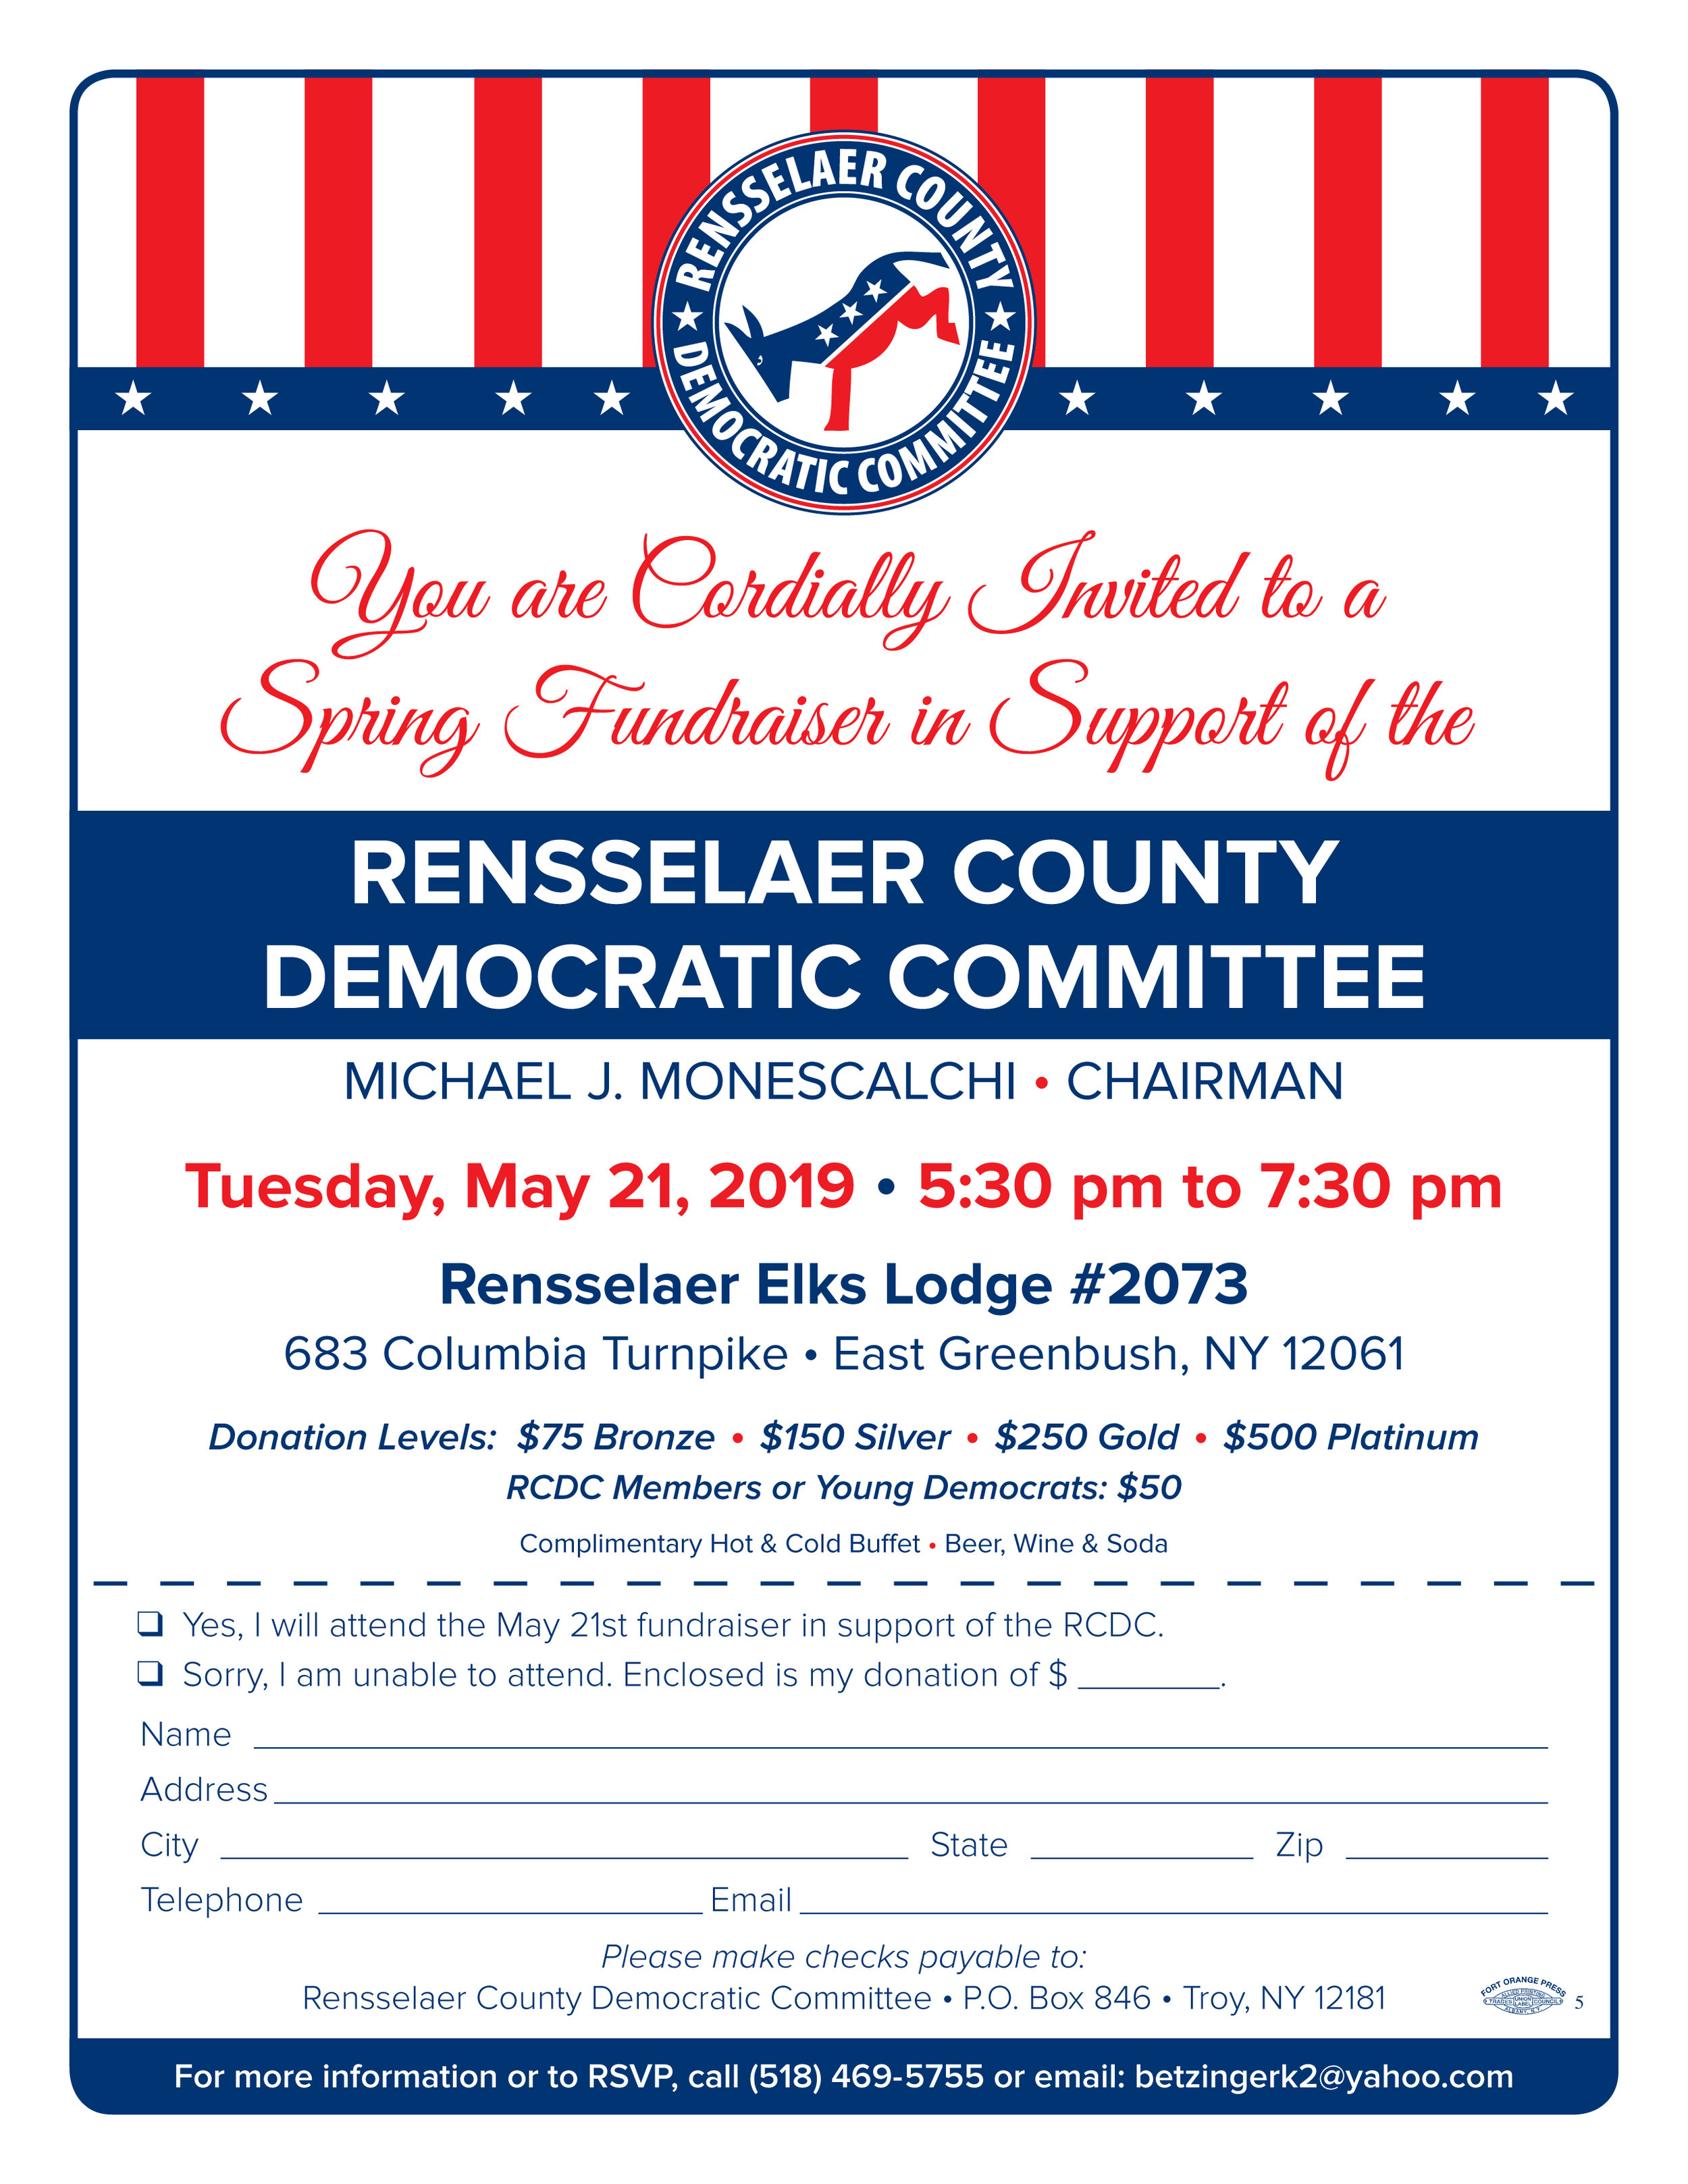 Rensselaer County Democratic Committee Fundraiser Invite - May 21 2019.jpg